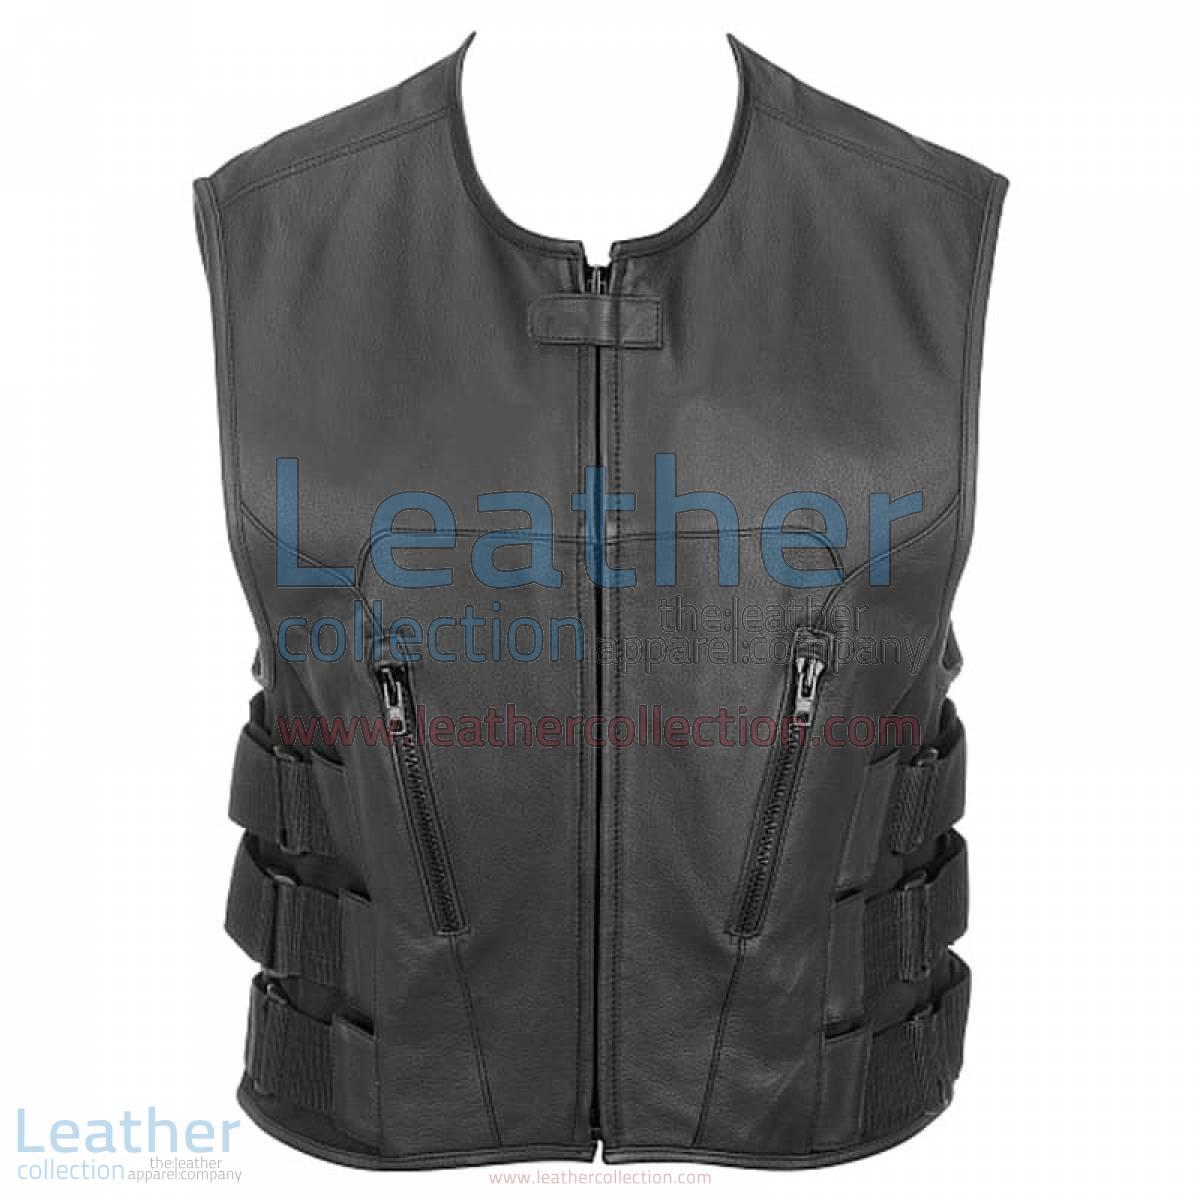 Leather Rider Vest with Velcro Side Straps   rider vest